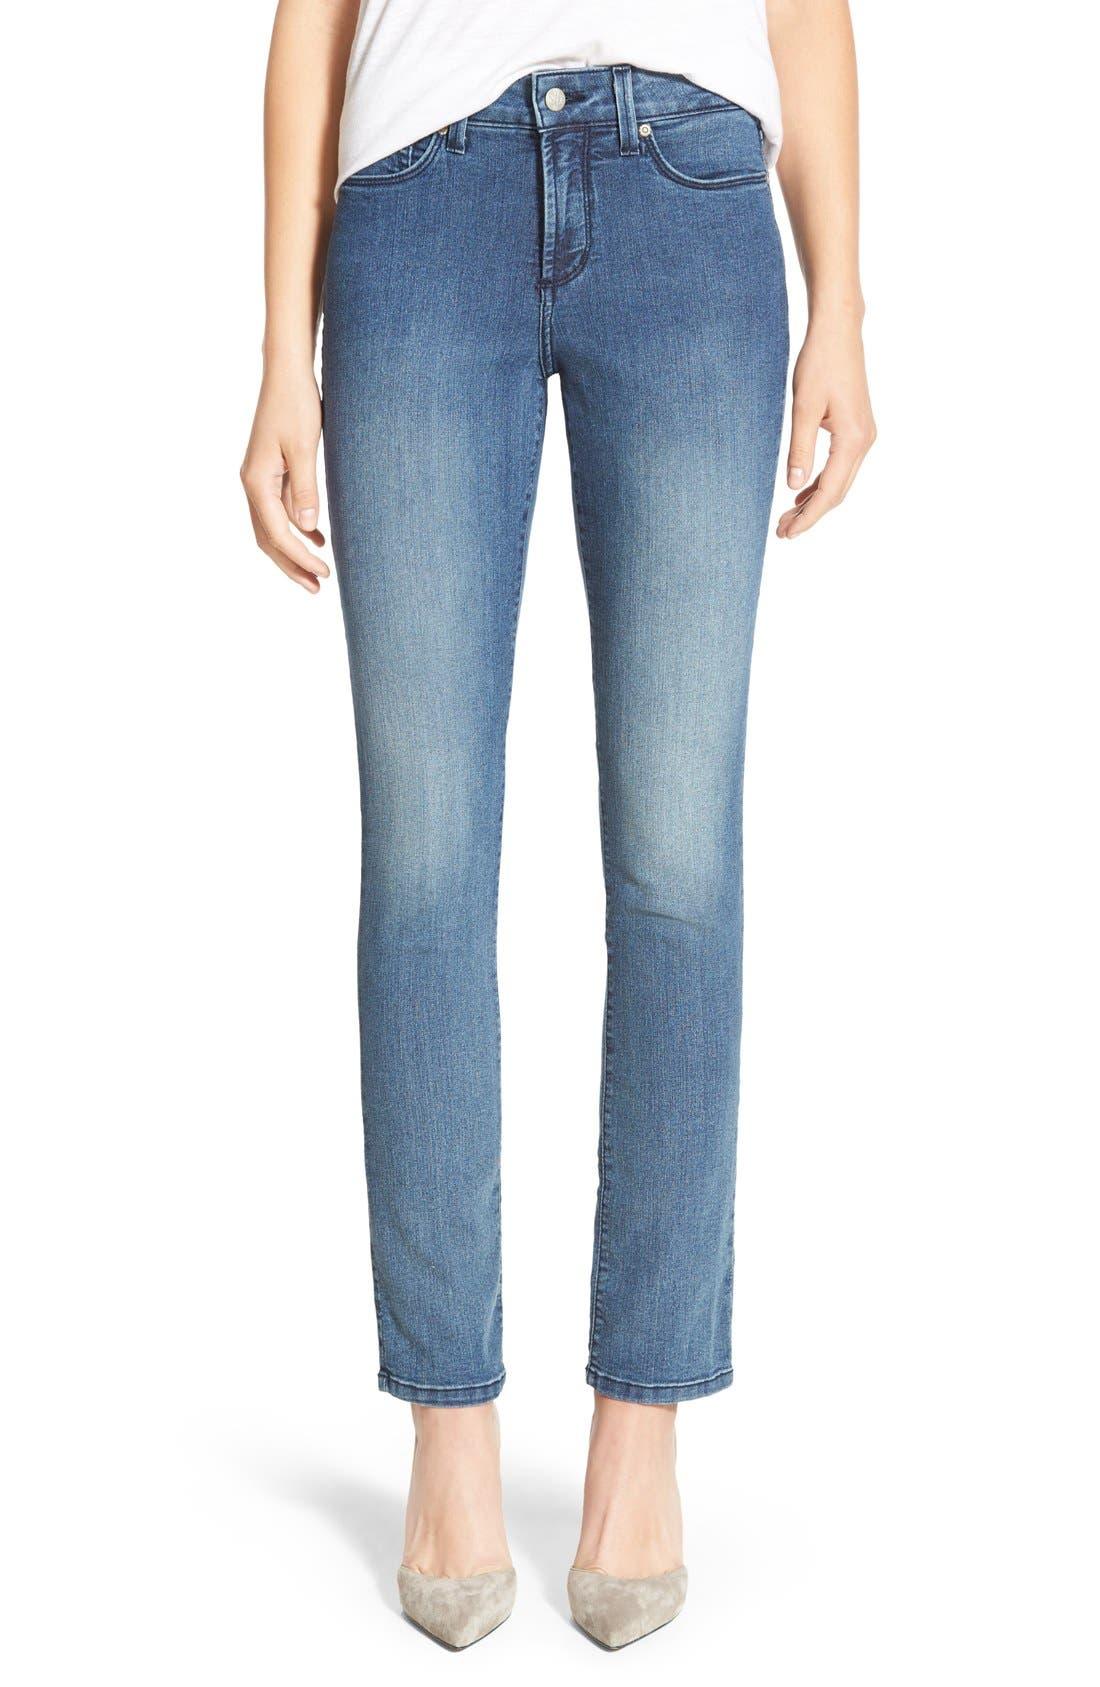 Alternate Image 1 Selected - NYDJ 'Sheri' Stretch Skinny Jeans (Karval) (Regular & Petite)